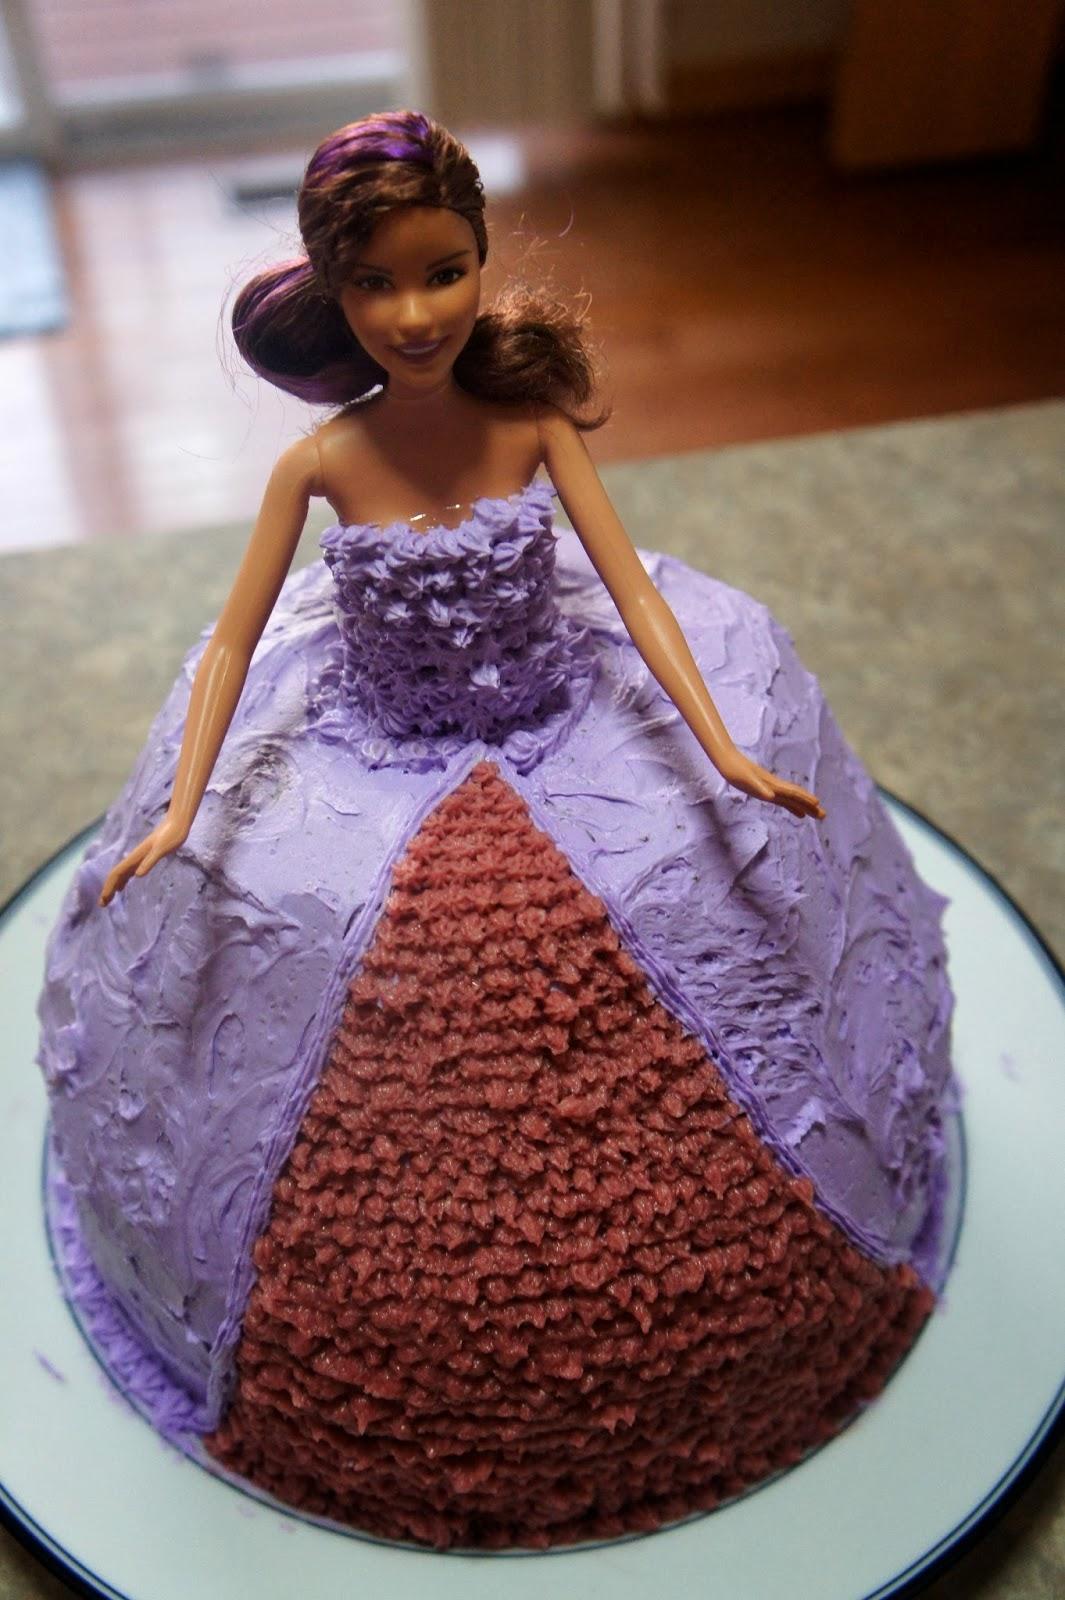 Barbie Chocolate Cake Images : Savory Sweet and Satisfying: Dark Chocolate Barbie Cake ...